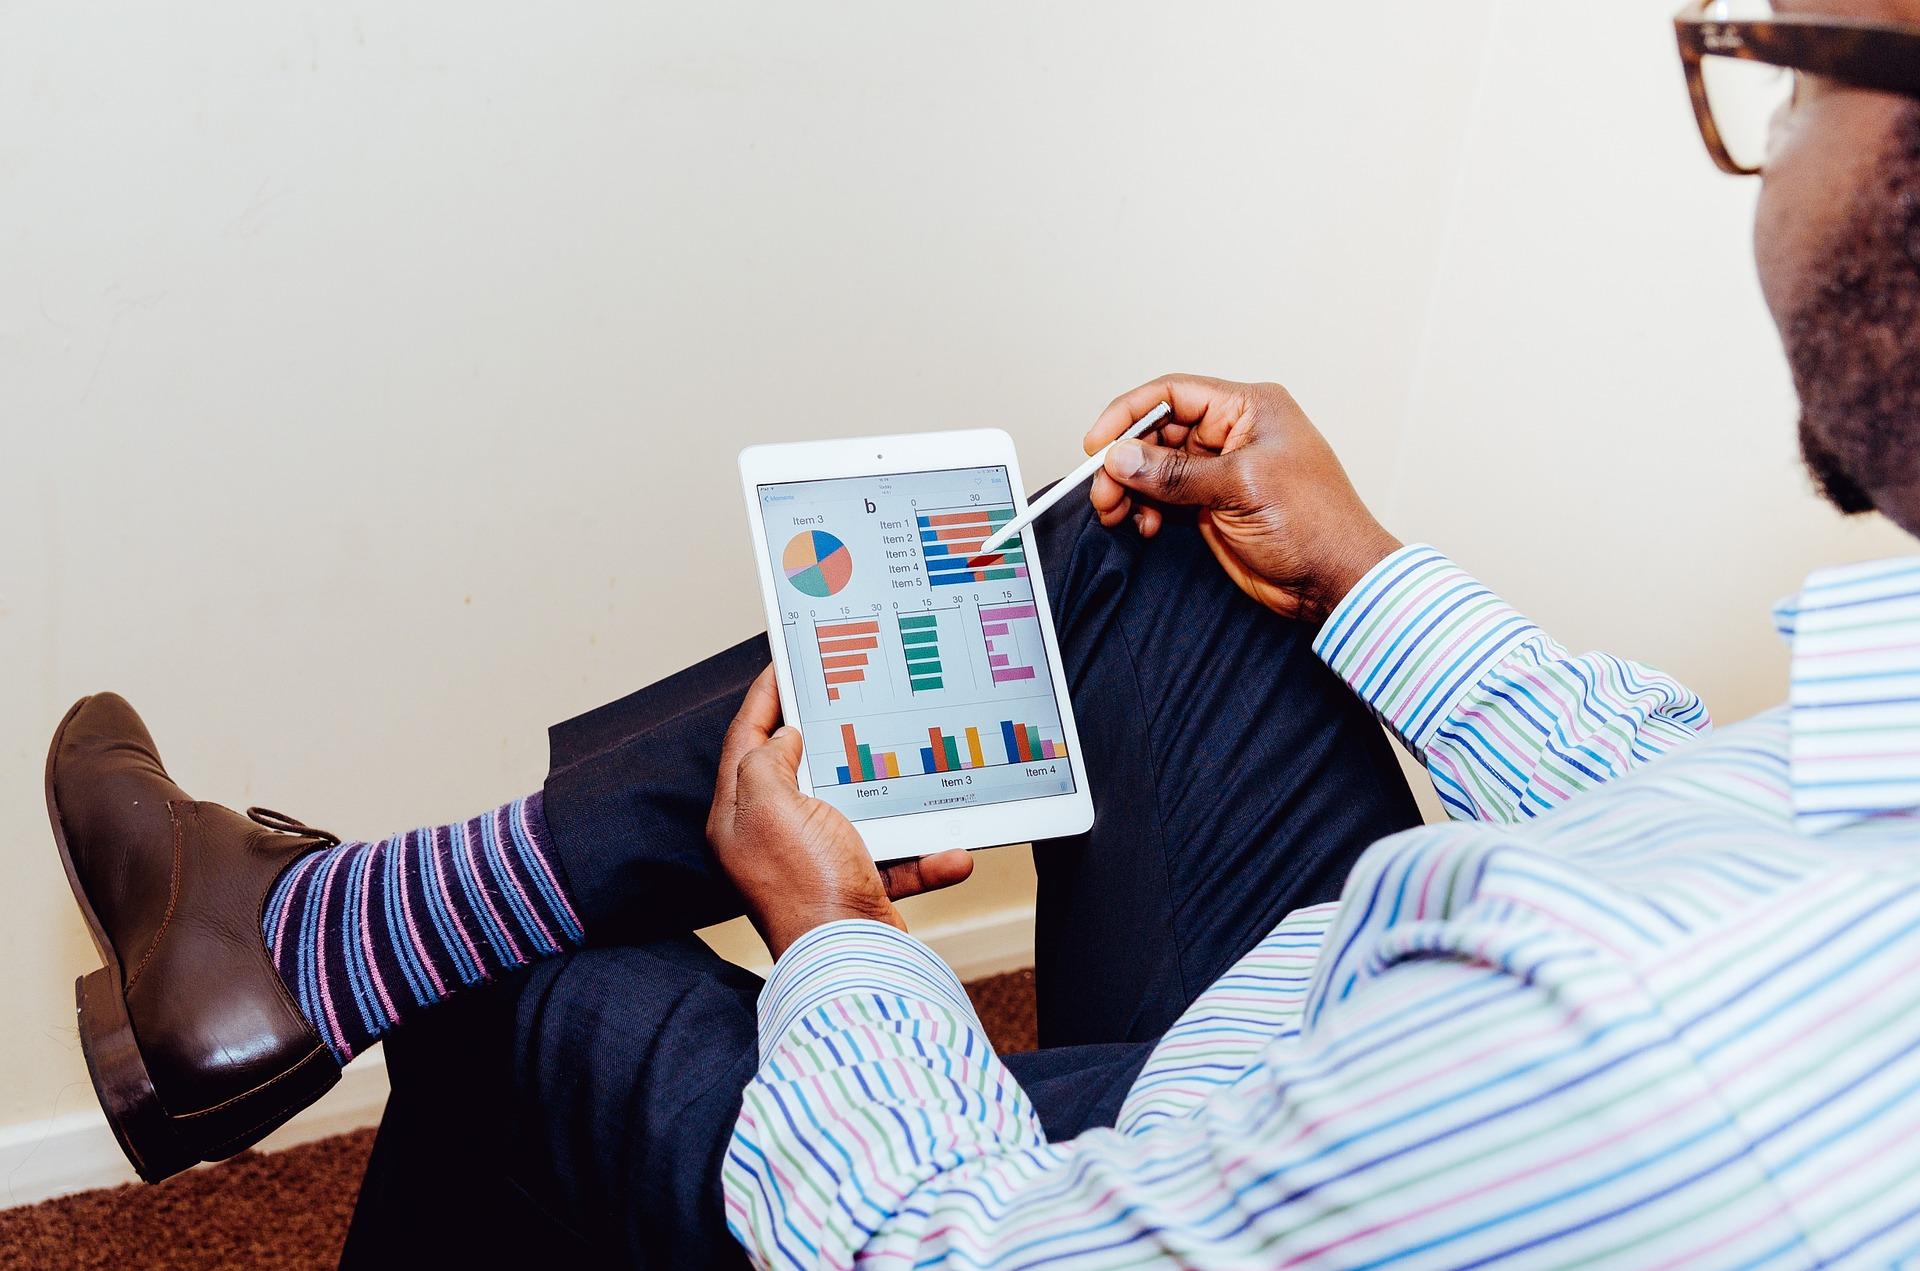 Entrepreneur tracking KPIs